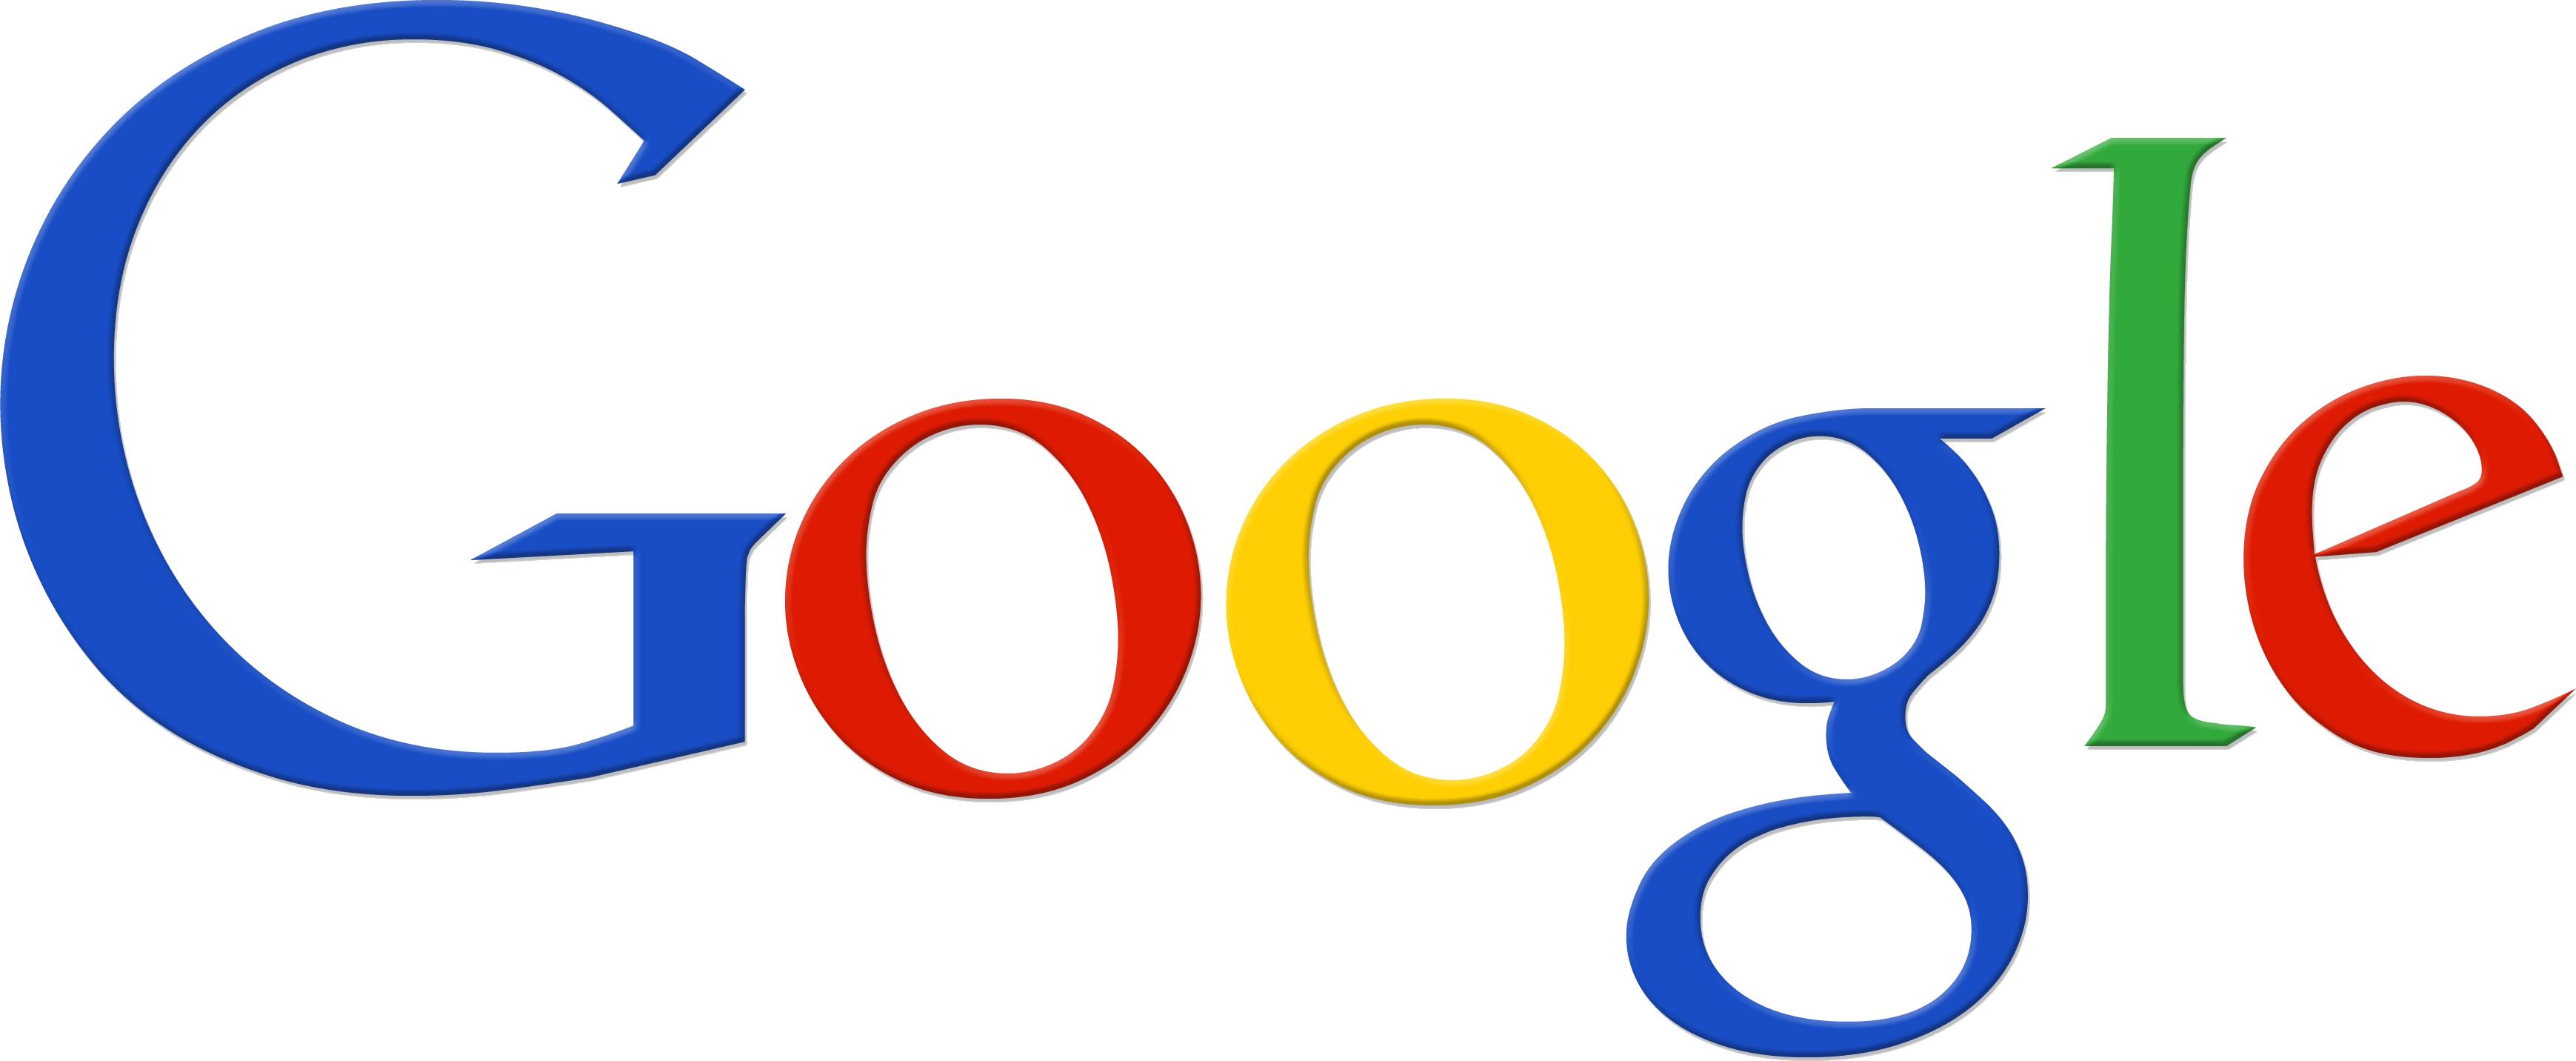 Clipart google images banner free Google Clipart (38+) Google Clipart Backgrounds banner free